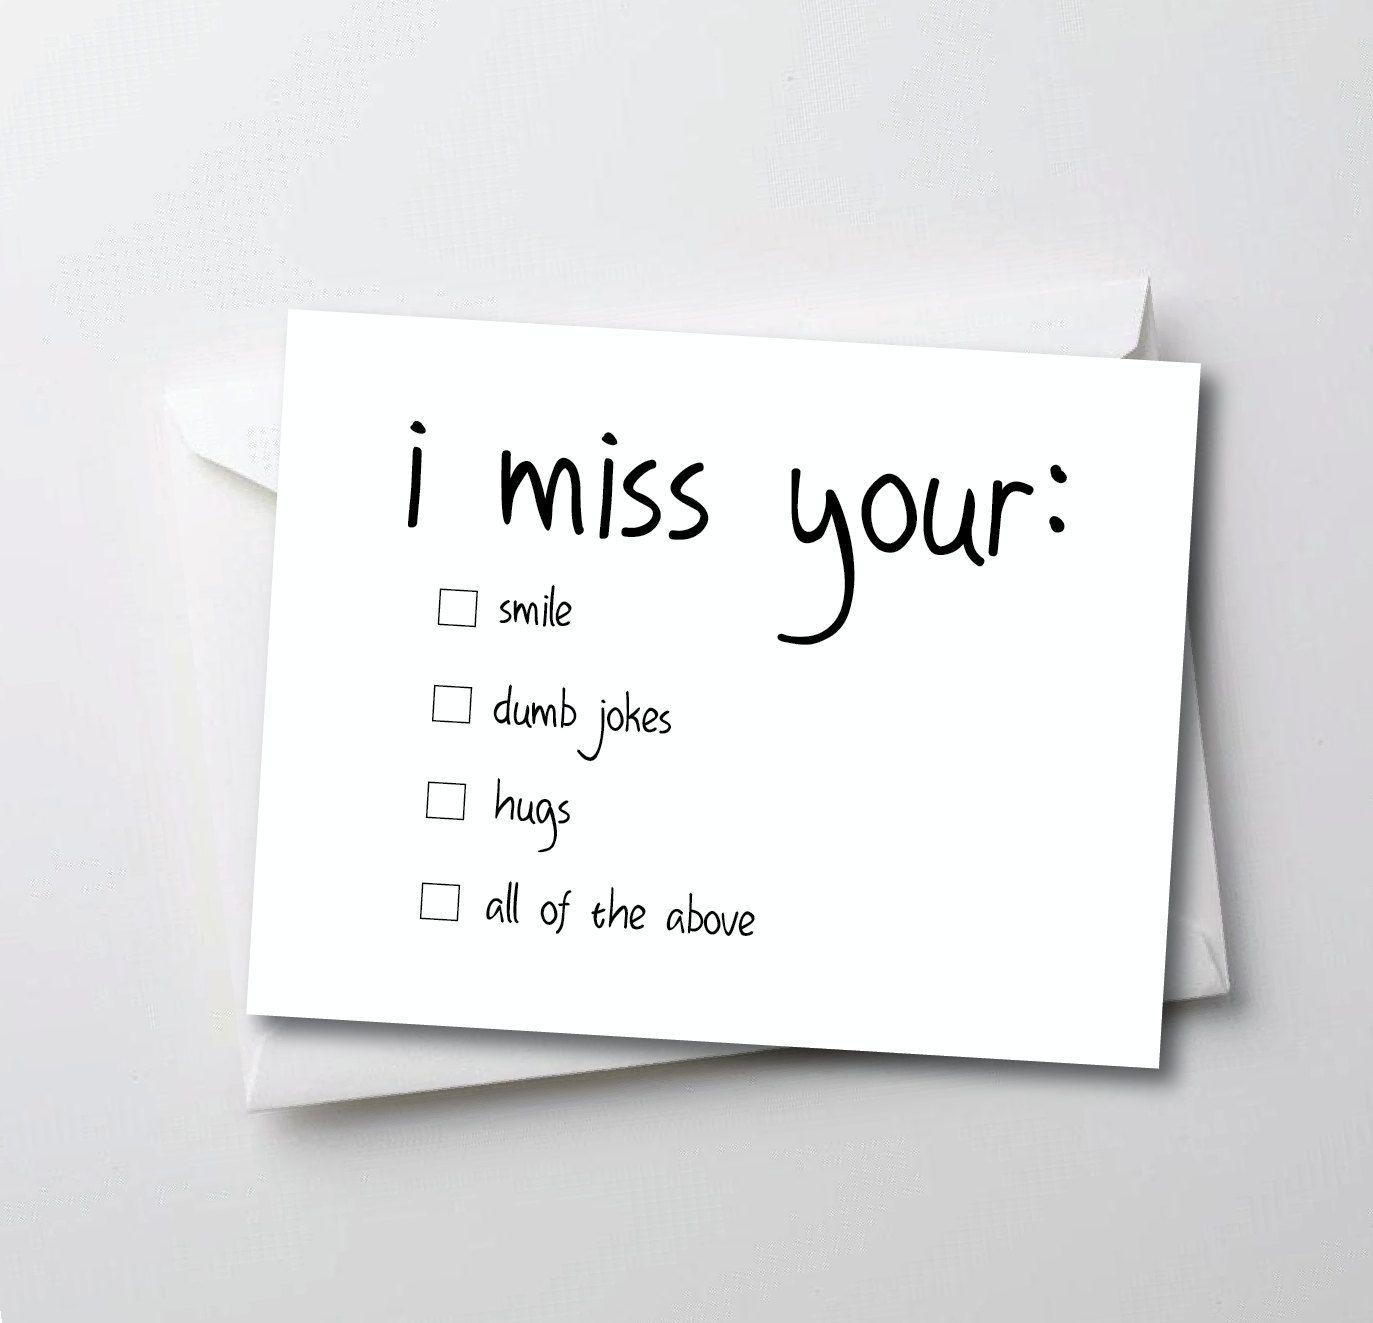 Fullsize Of Miss You Funny